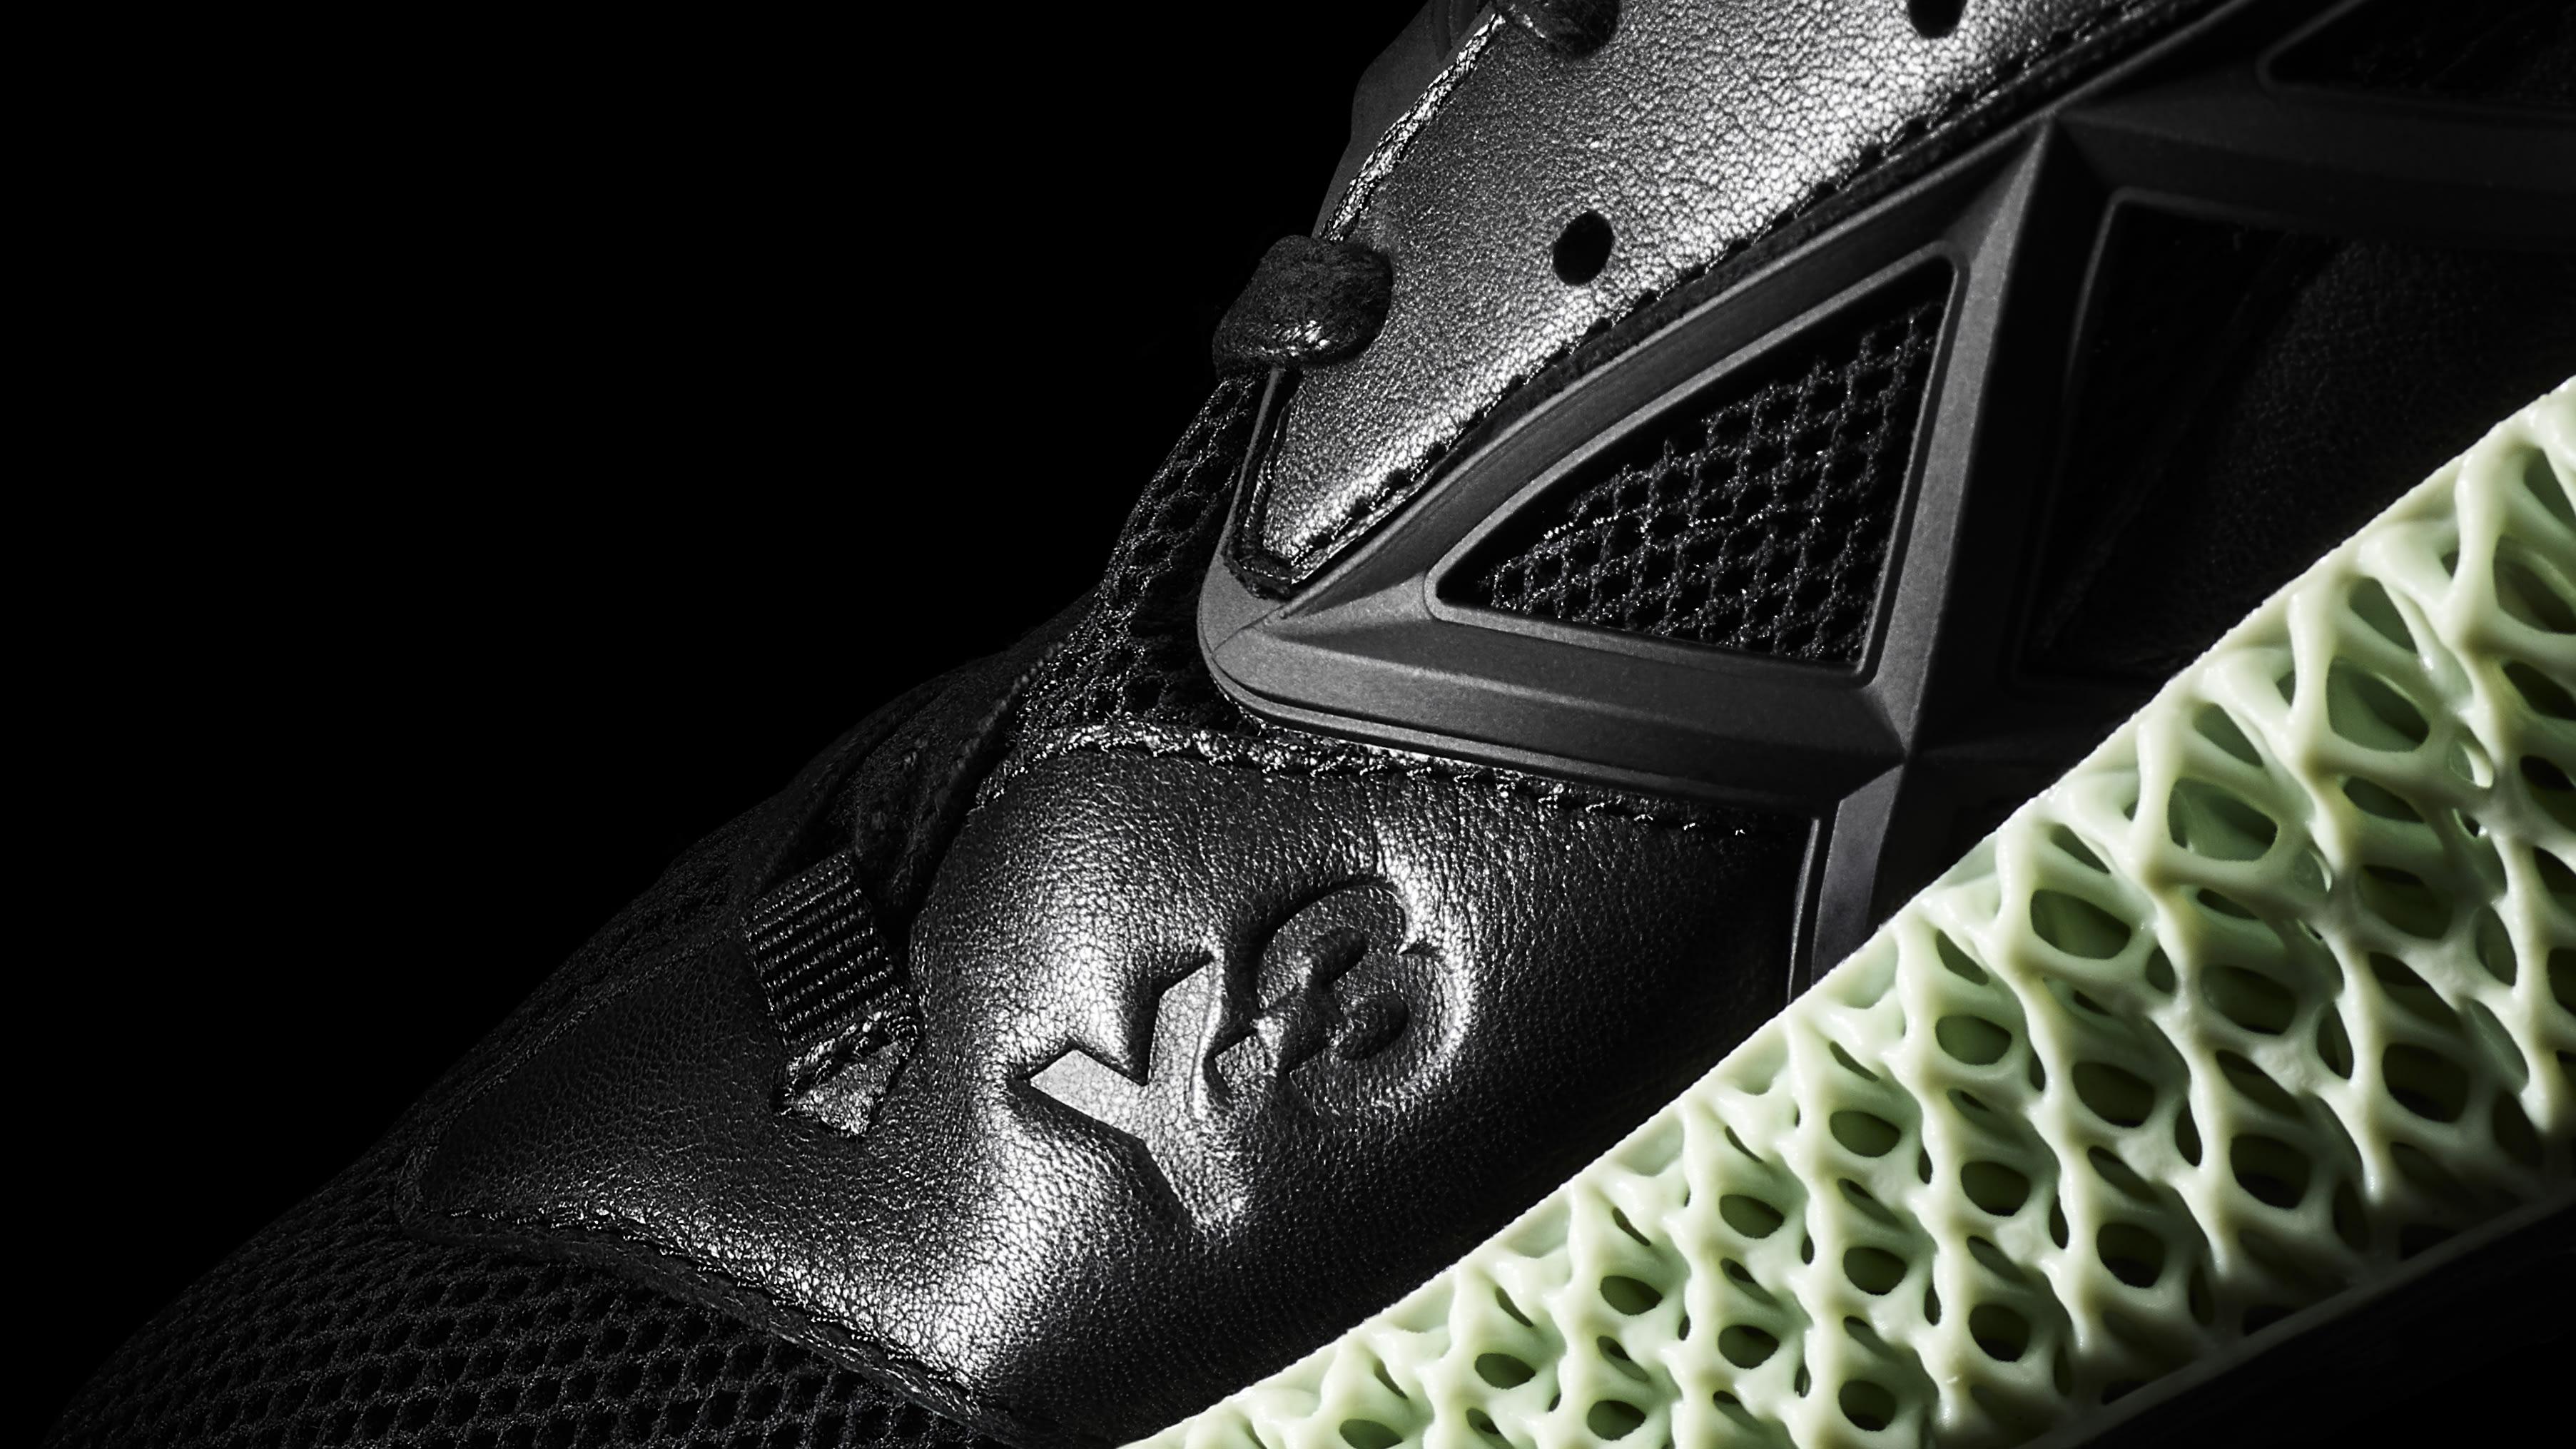 adidas-y-3-runner-4d-2019-medial-branding